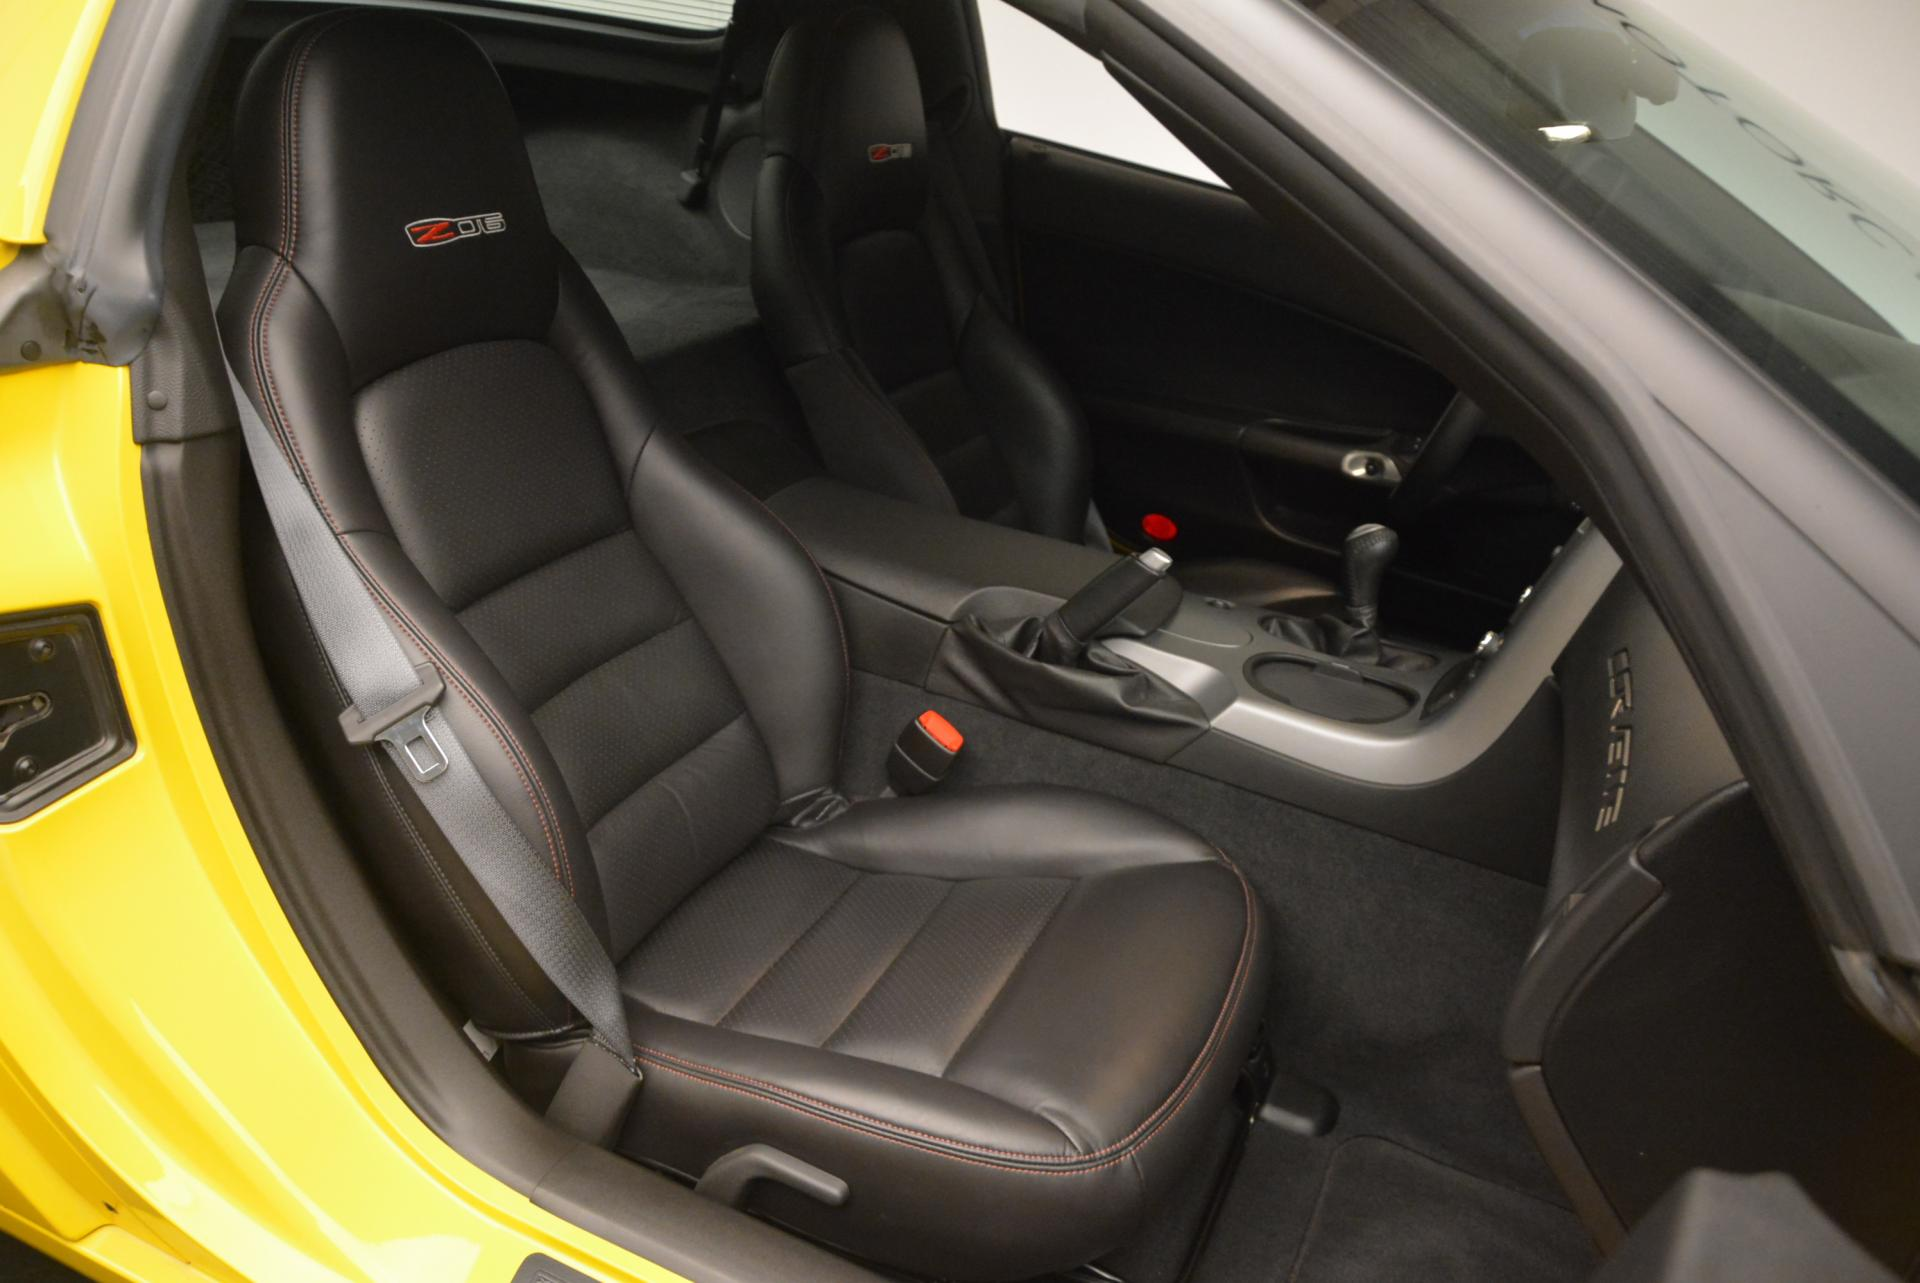 Used 2006 Chevrolet Corvette Z06 Hardtop For Sale In Greenwich, CT 530_p17